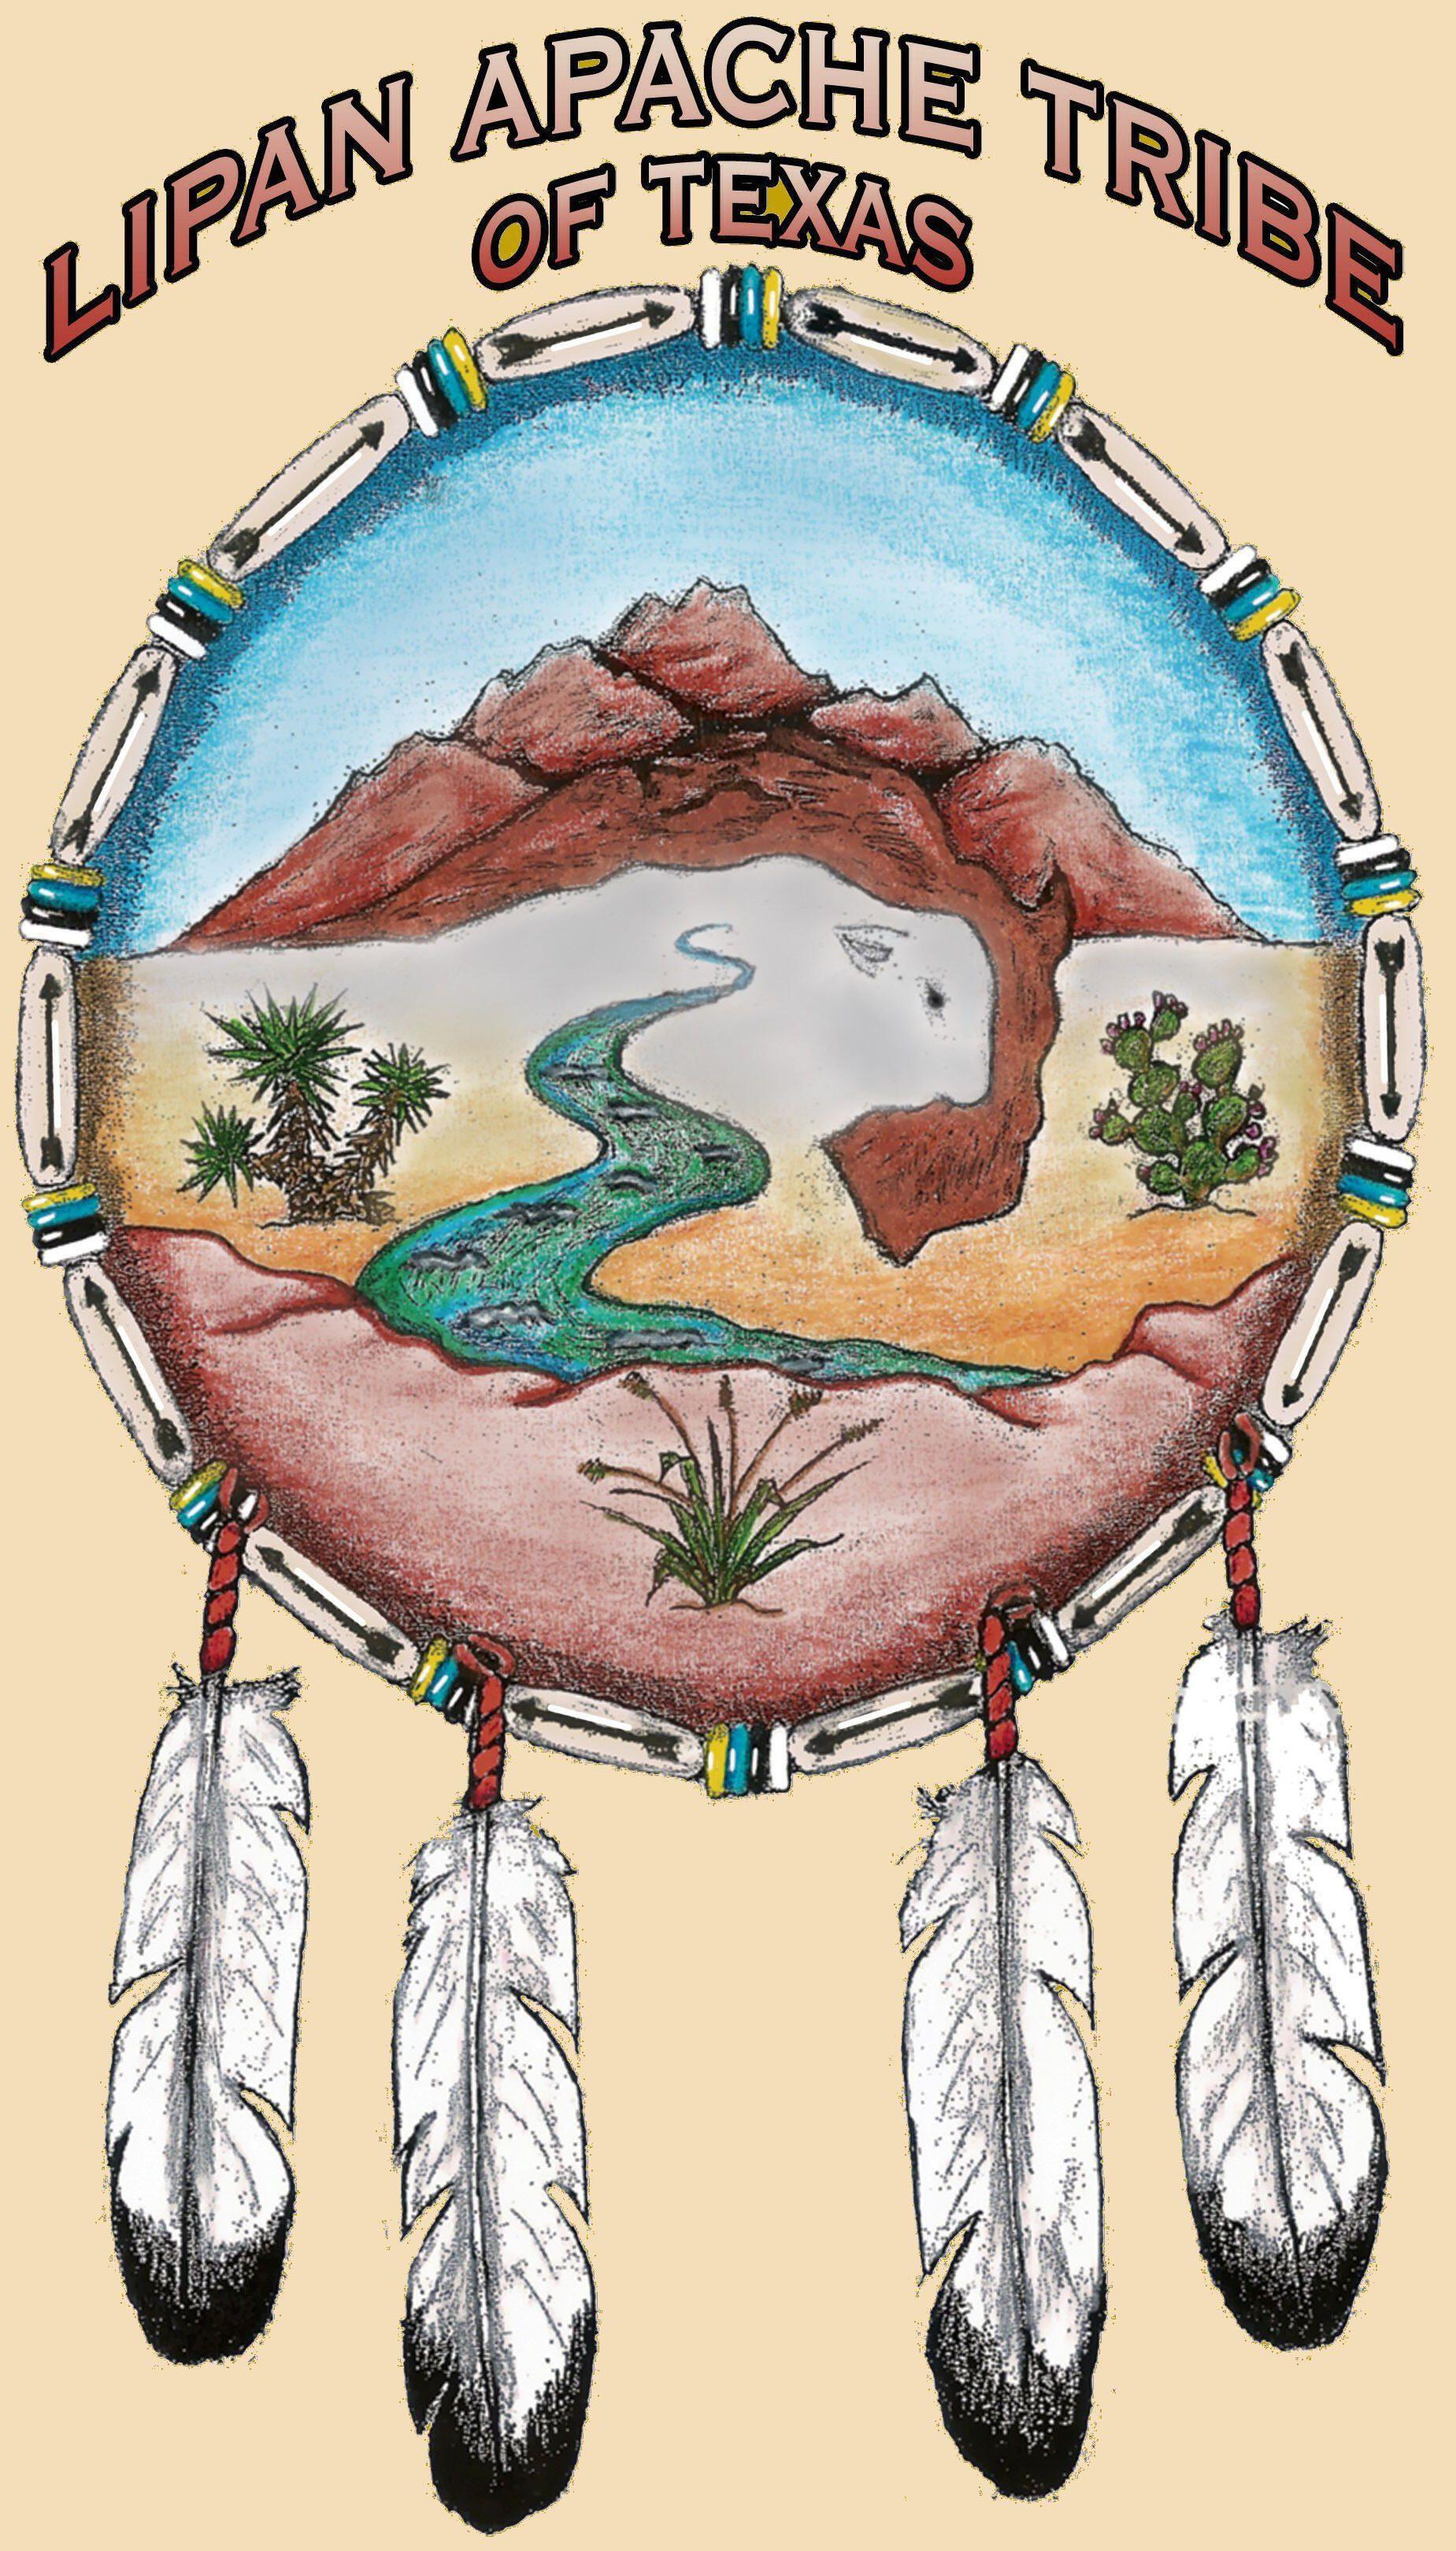 Lipan Apache Tribe Of Texas The Lipan Apache Were